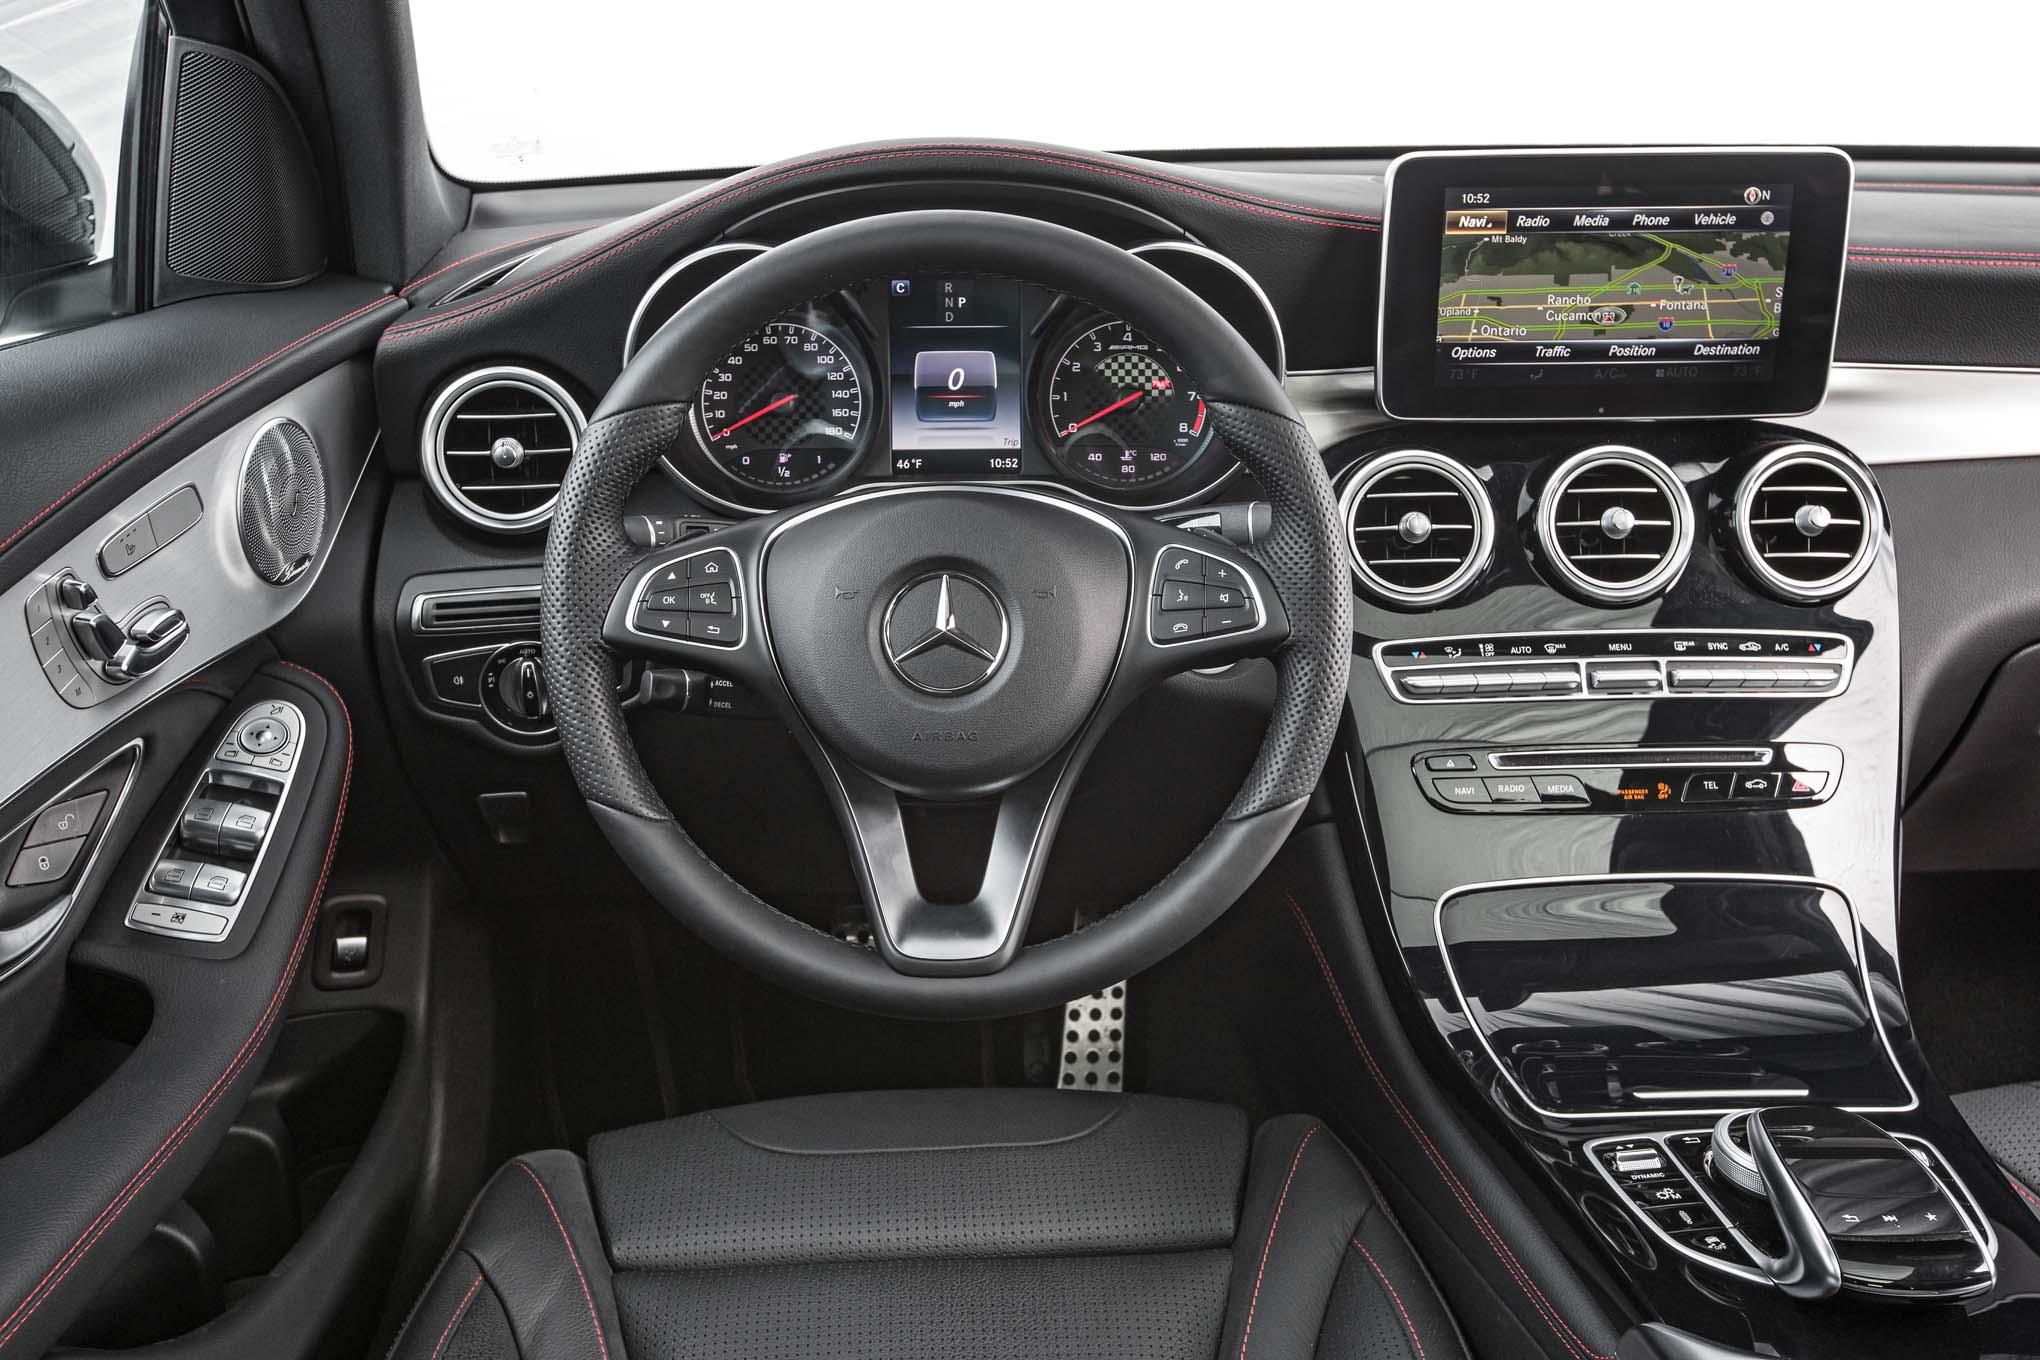 2017 mercedes amg glc43 4matic cockpit motor trend en espa ol. Black Bedroom Furniture Sets. Home Design Ideas